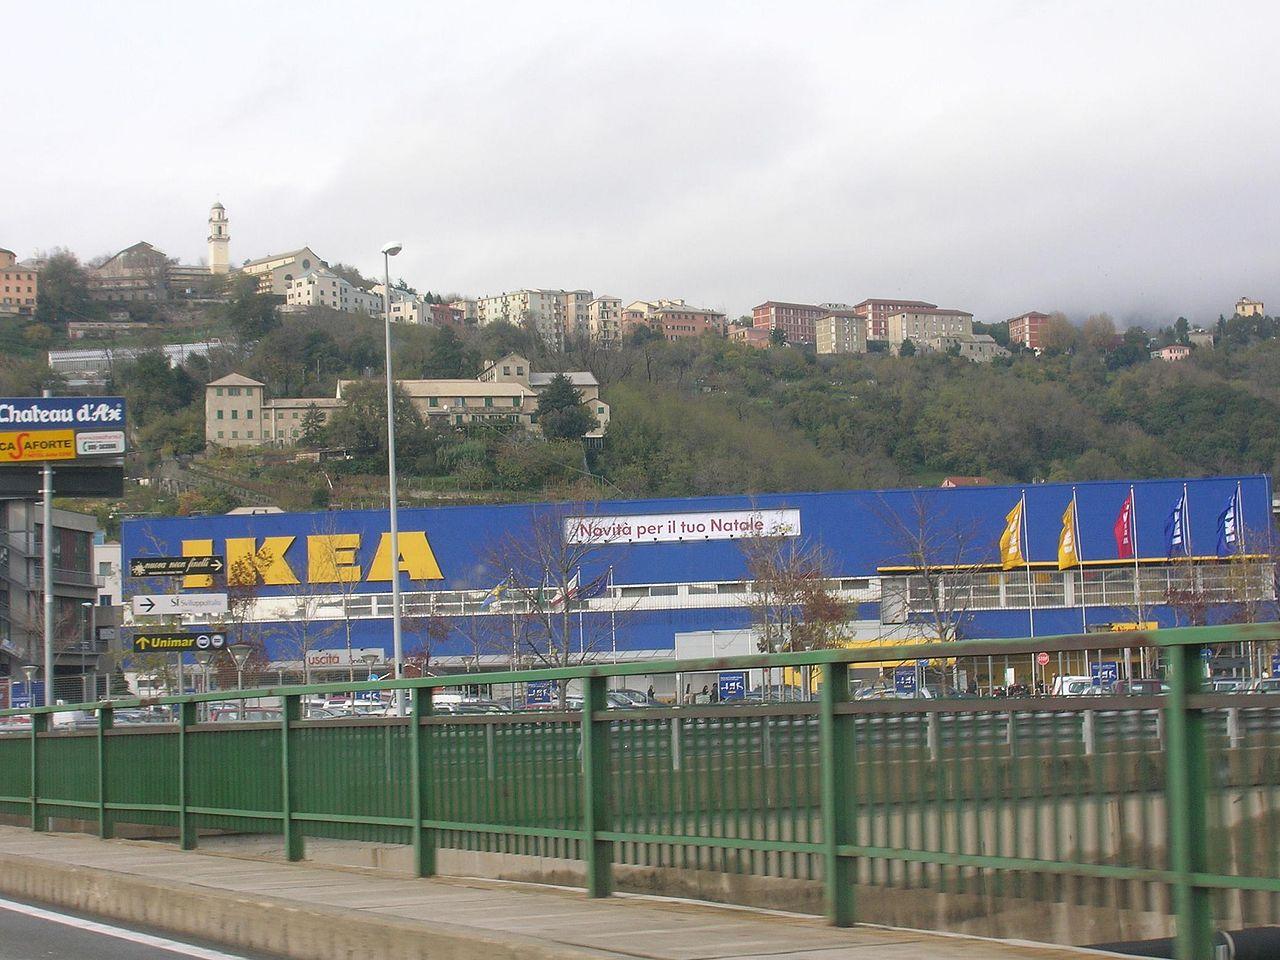 Filegenova Magazzino Ikeajpg Wikimedia Commons